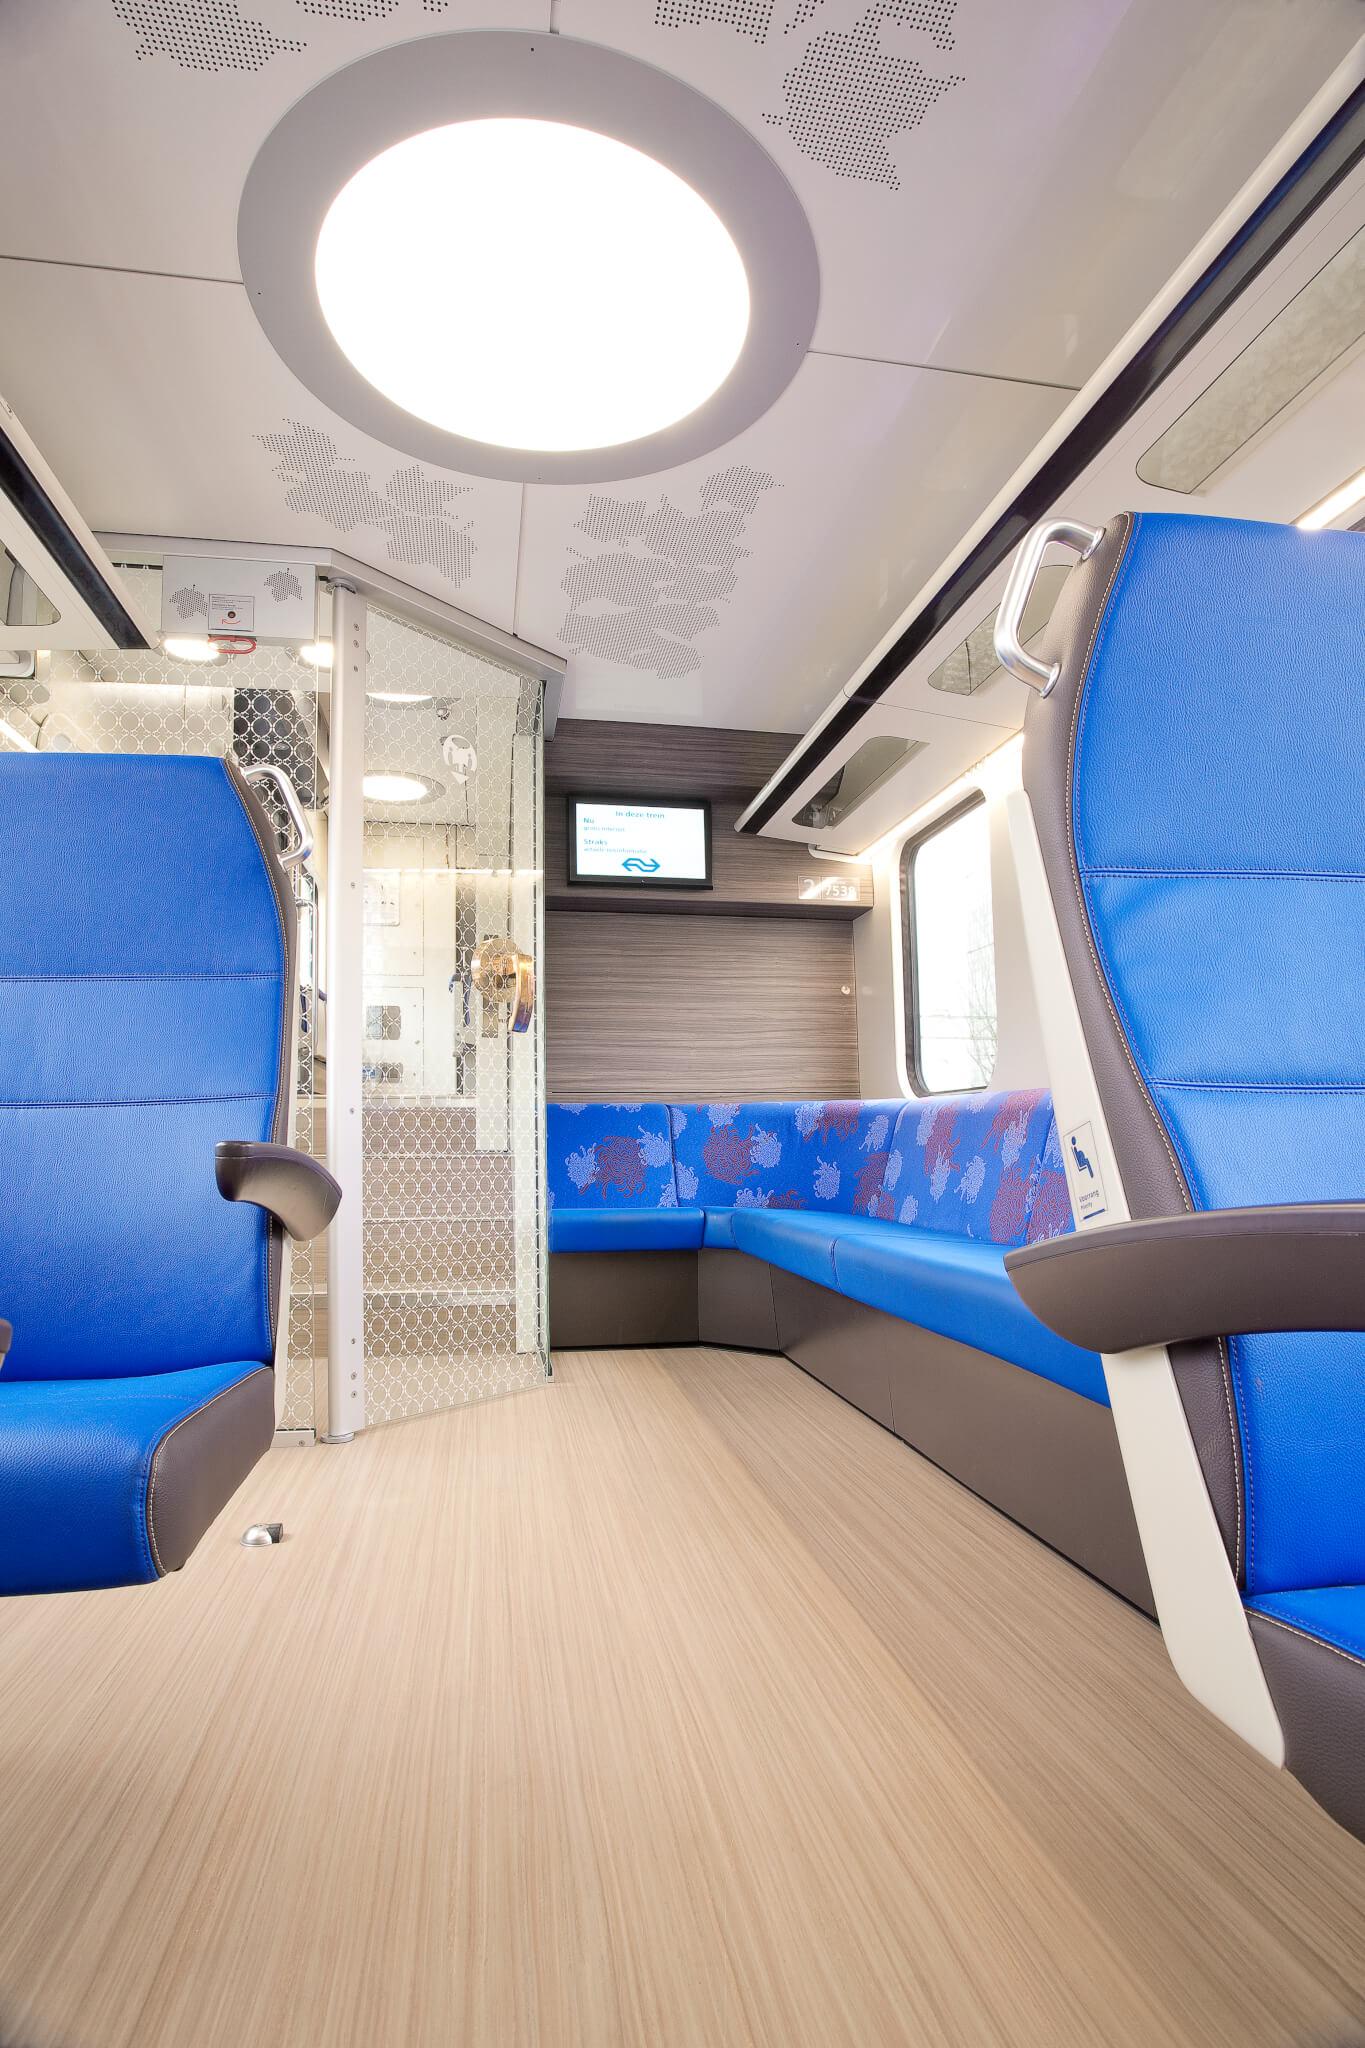 Railway news ns trains interior carriage for Interior decorators dartmouth ns